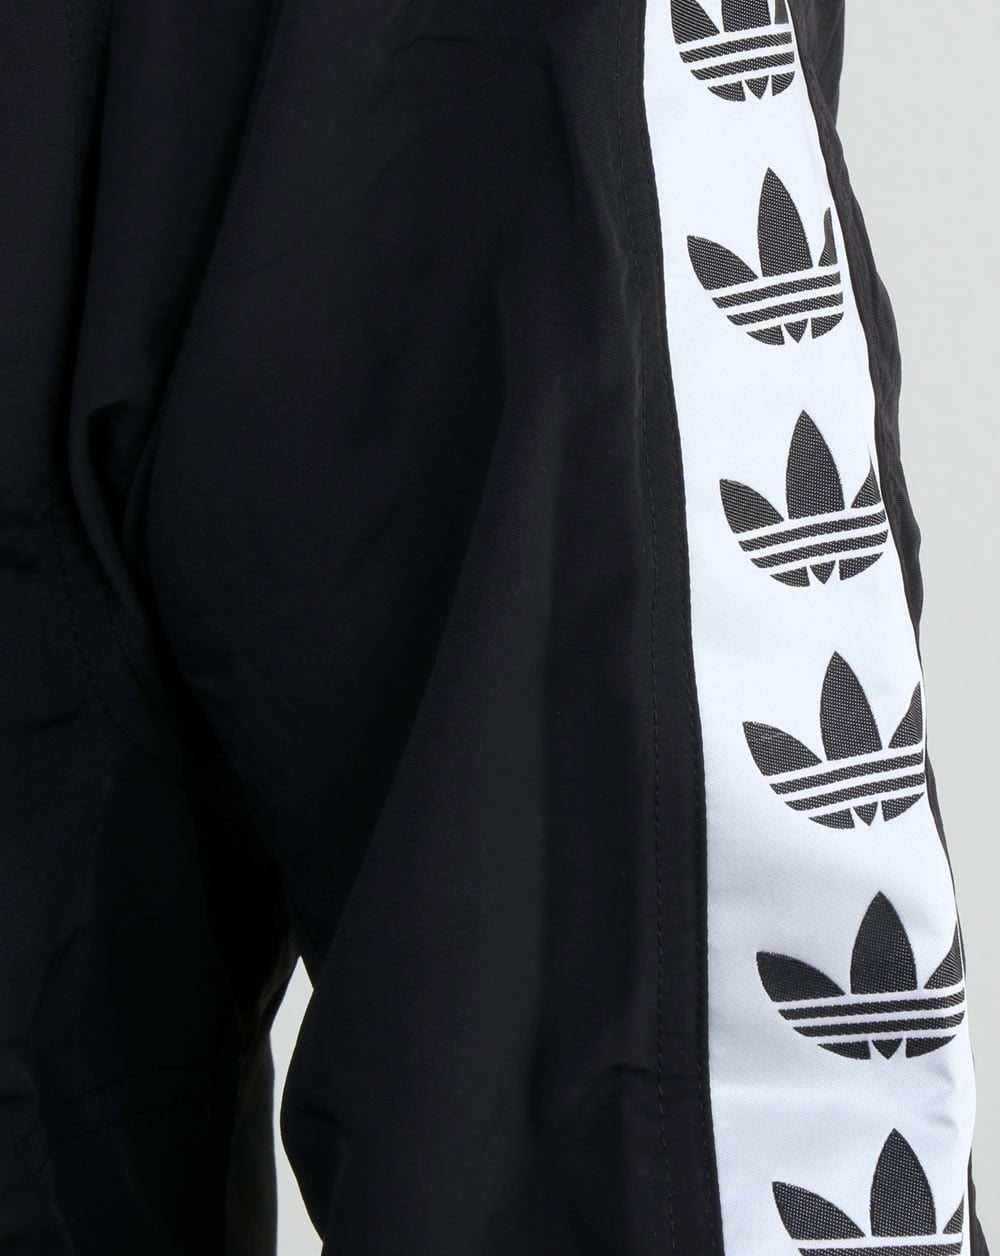 Adidas Tnt Black And White Taped Crewneck Sweatshirt Ficts